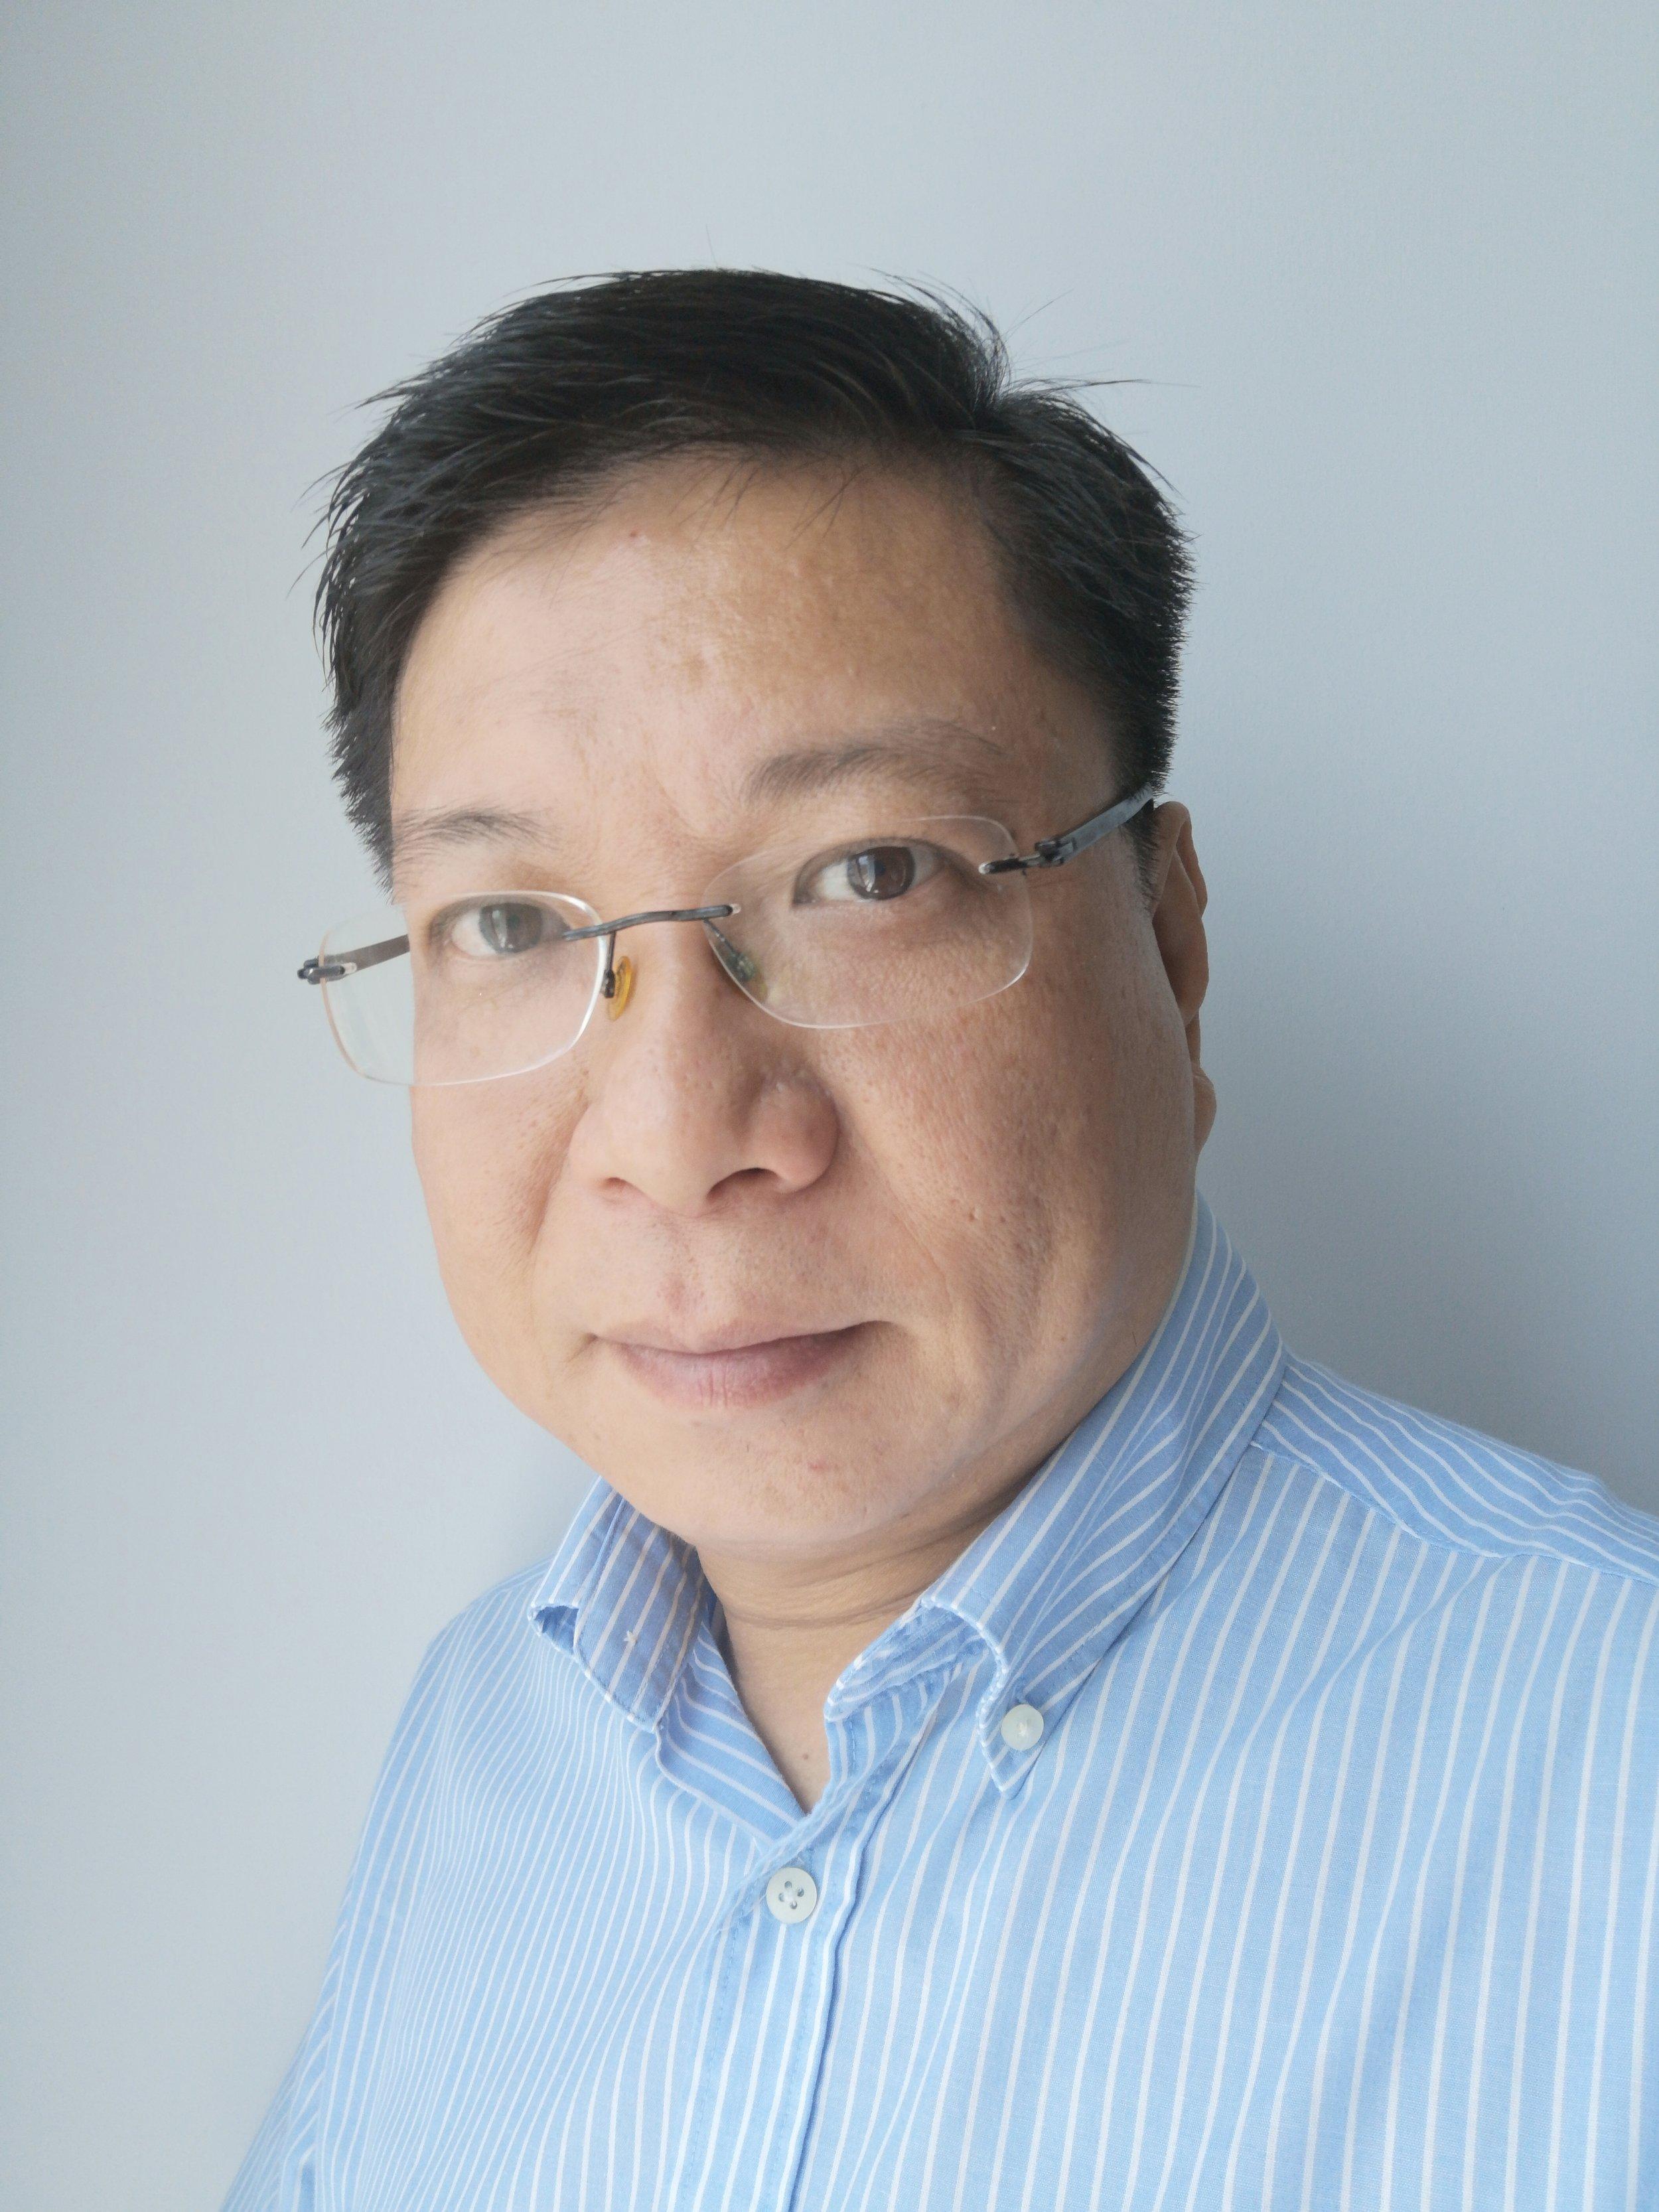 Raymond Chan - 陈贤友 / 区域销售经理电子邮件:raymond.chan@atlasconverting.com